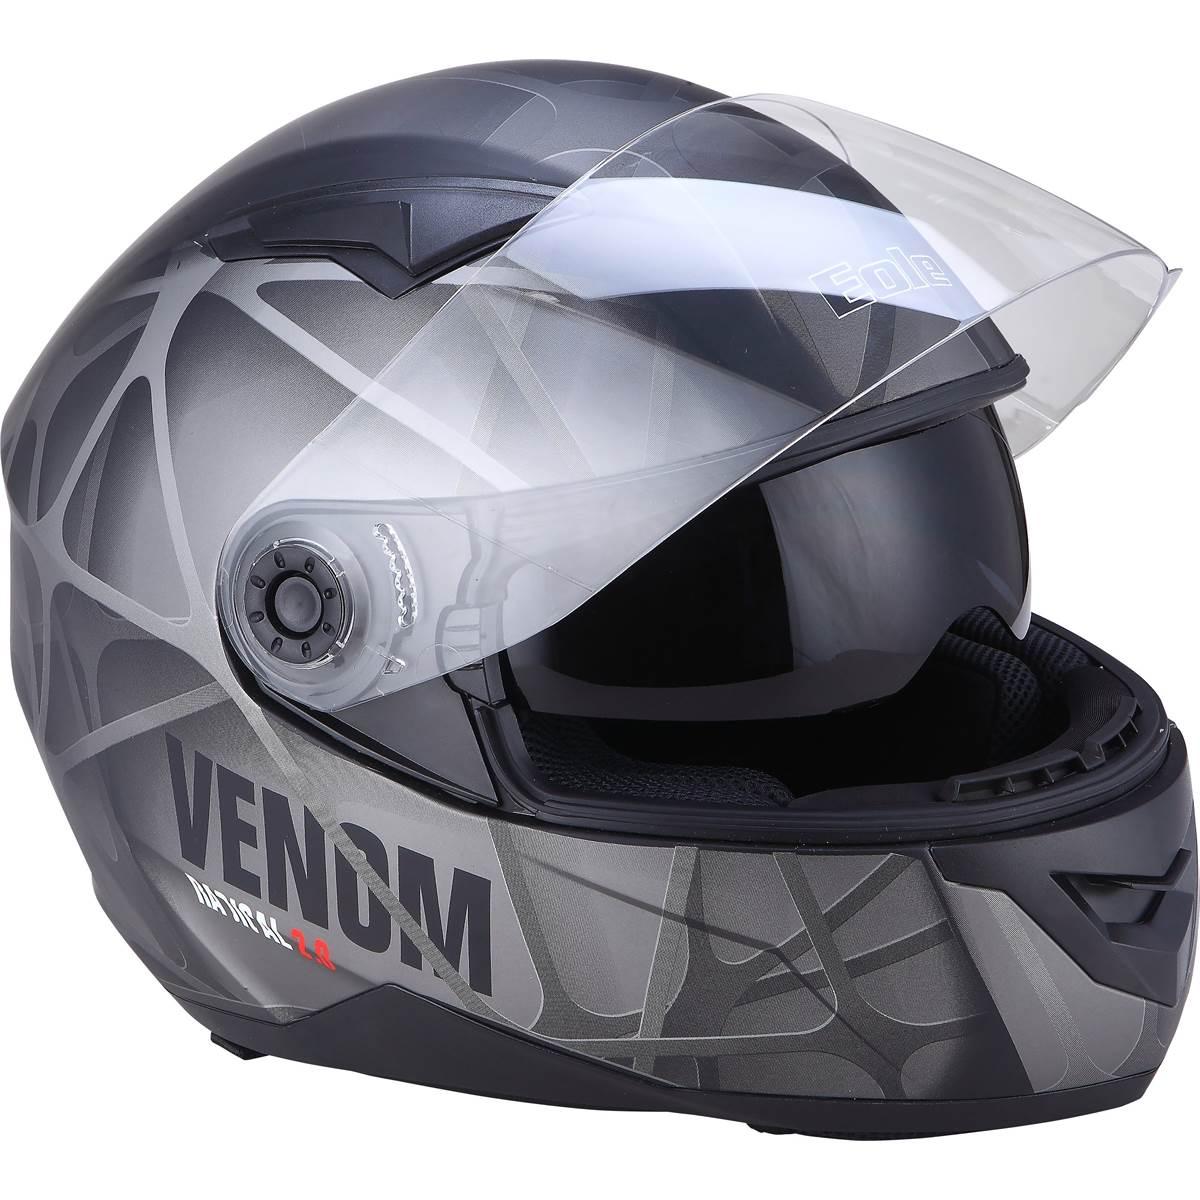 Casque Moto Intégral Ds Venom Taille L Eole Feu Vert